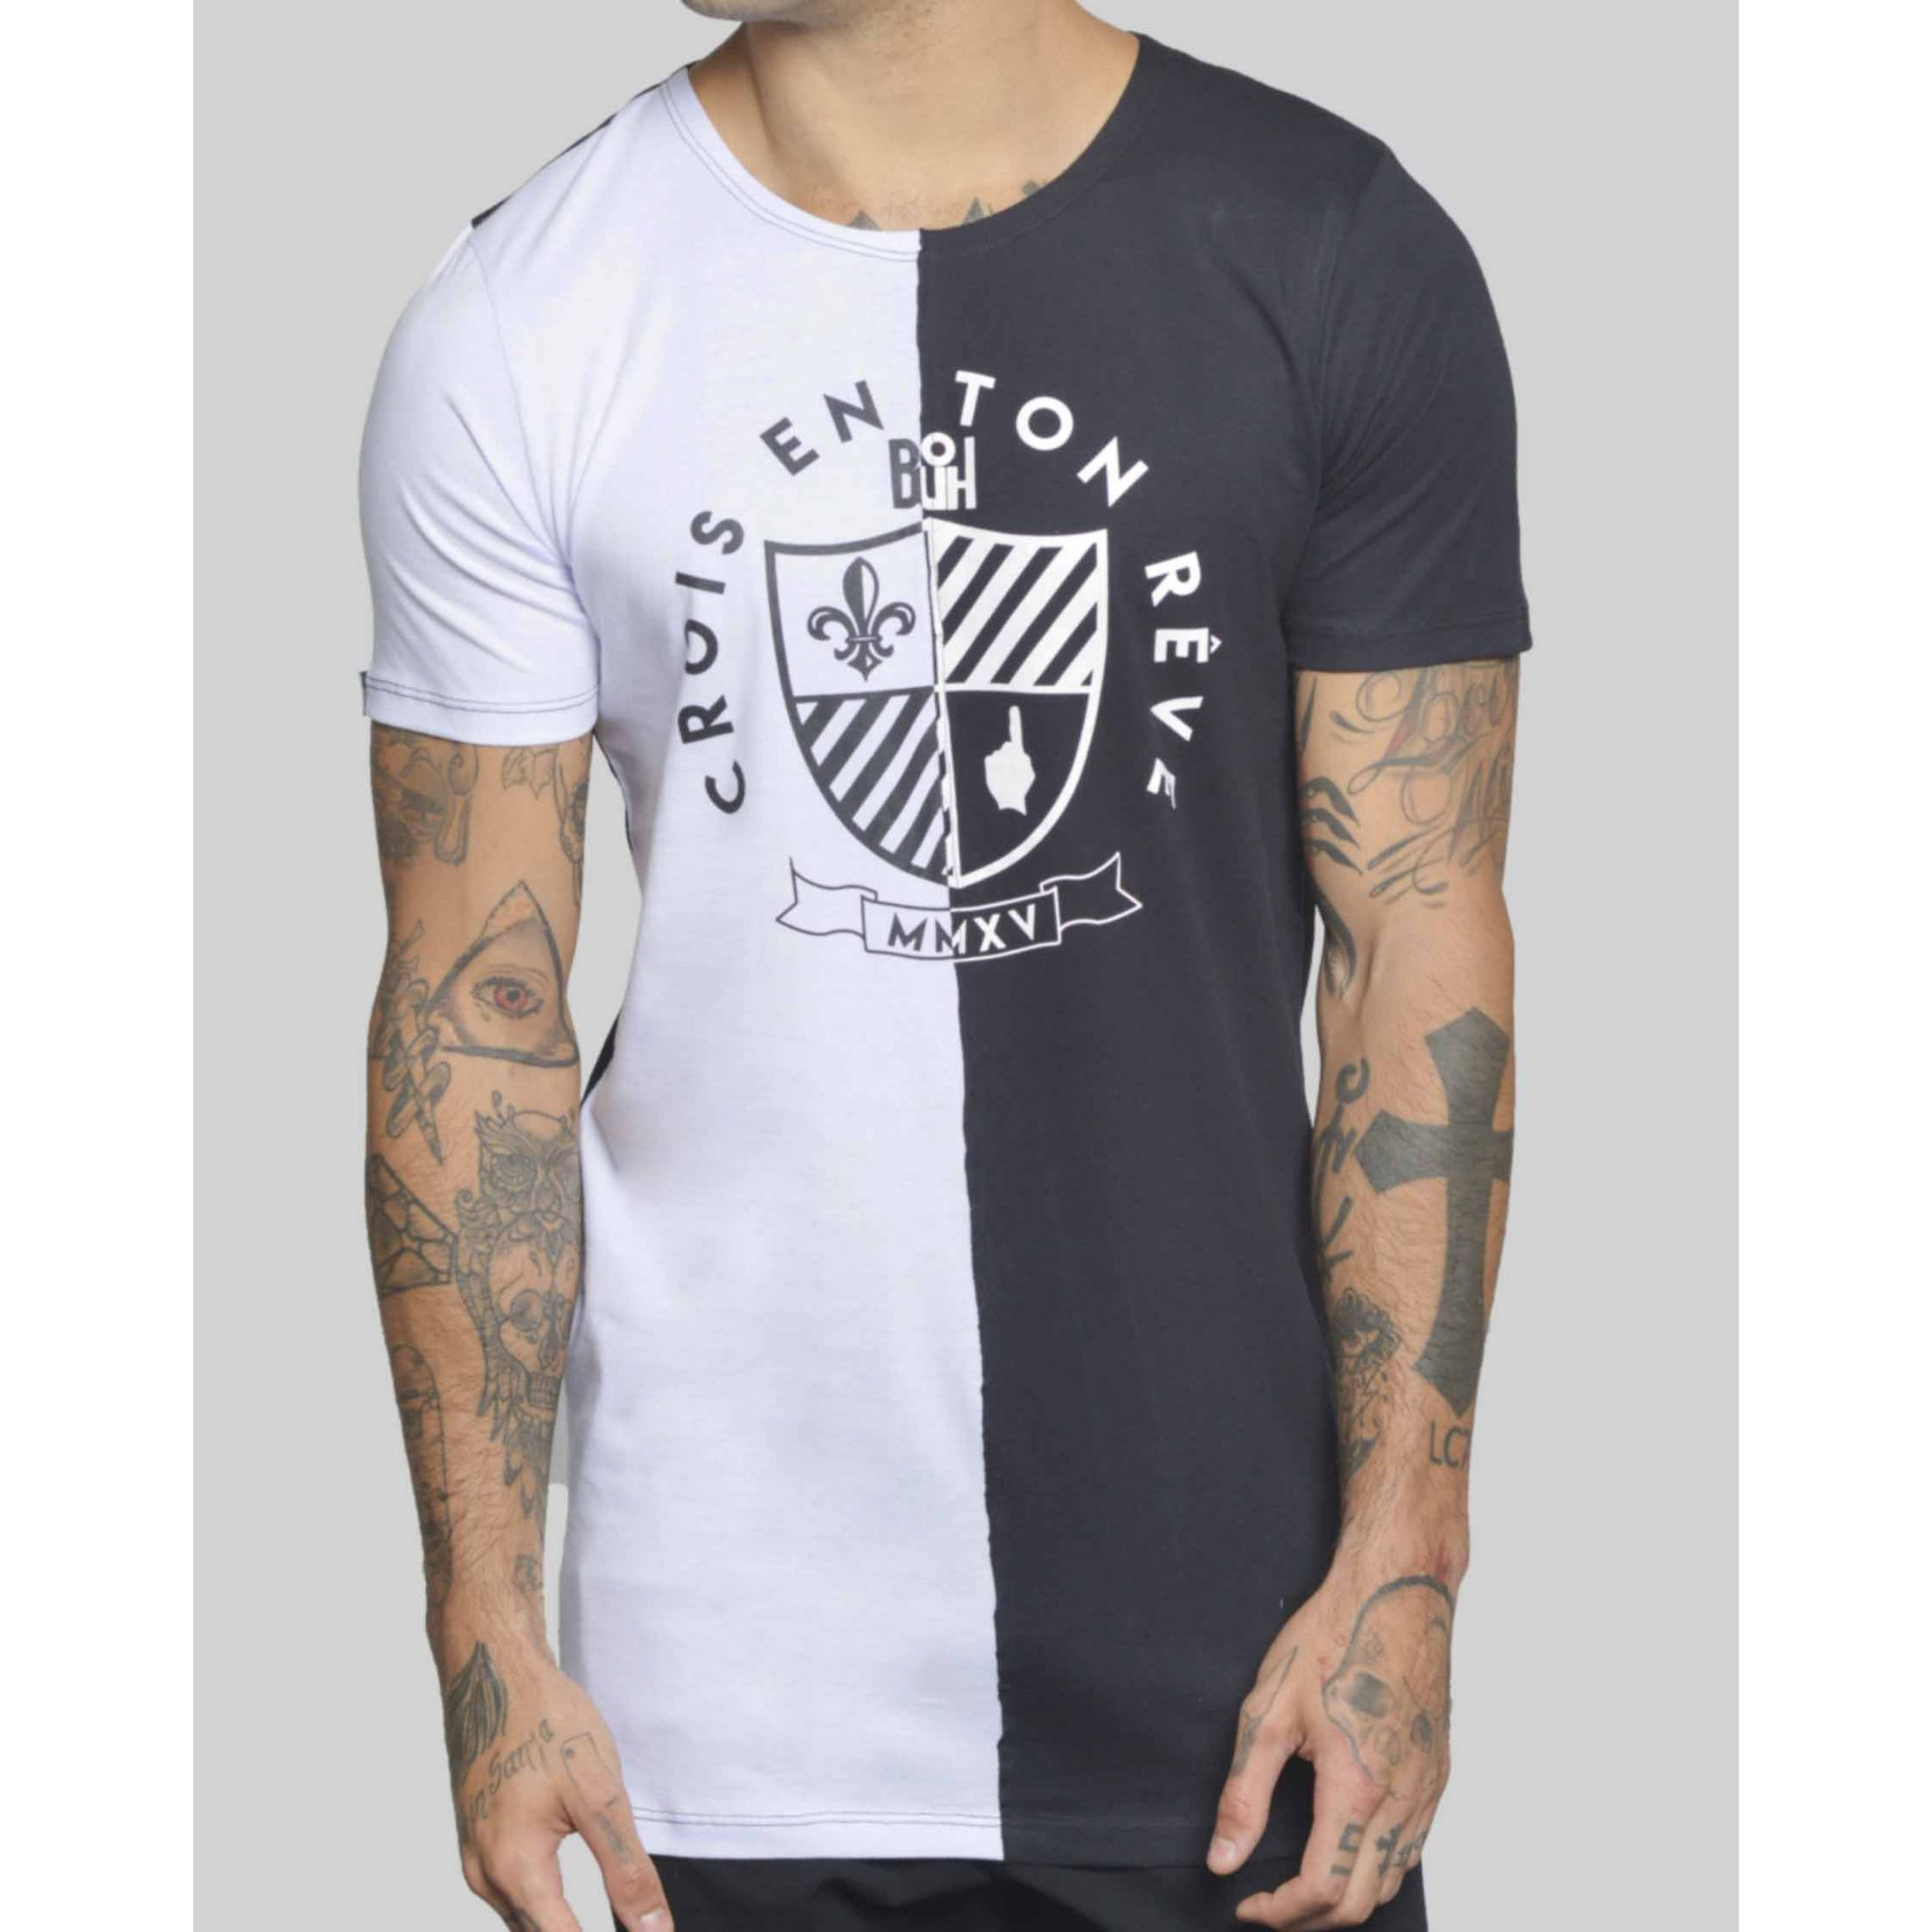 Camiseta Buh Crois En Ton Rêver